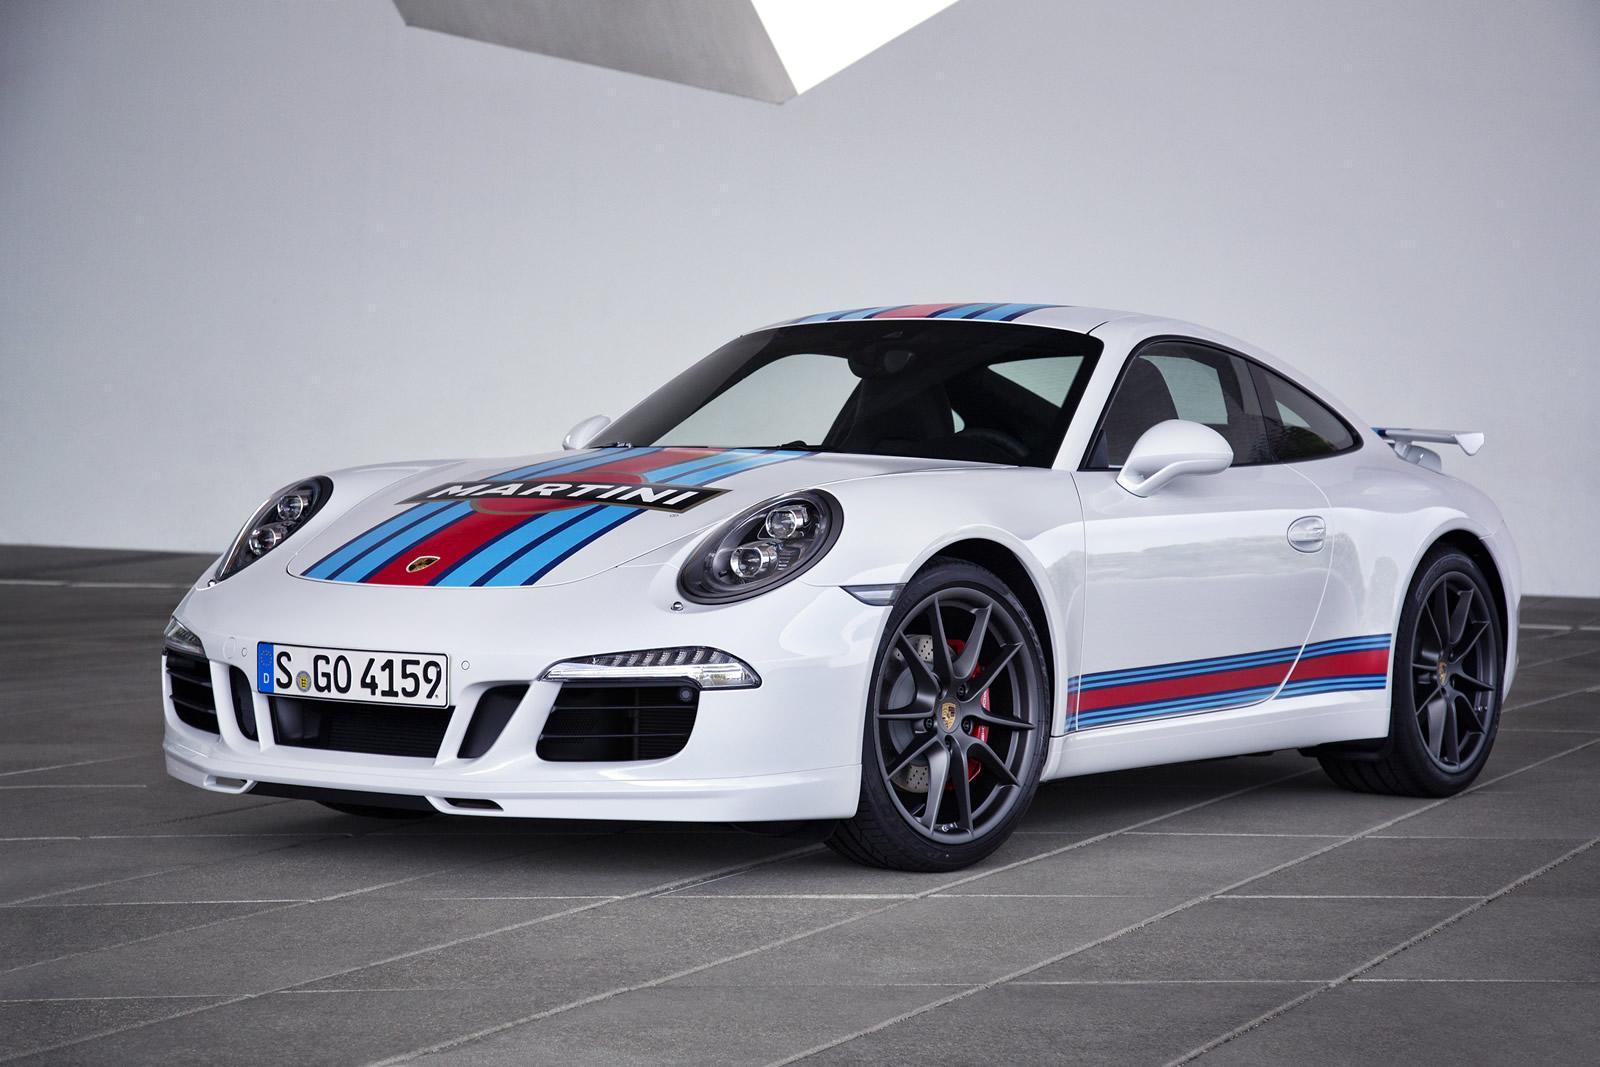 porsche 911 carrera s martini racing edition arrives for. Black Bedroom Furniture Sets. Home Design Ideas